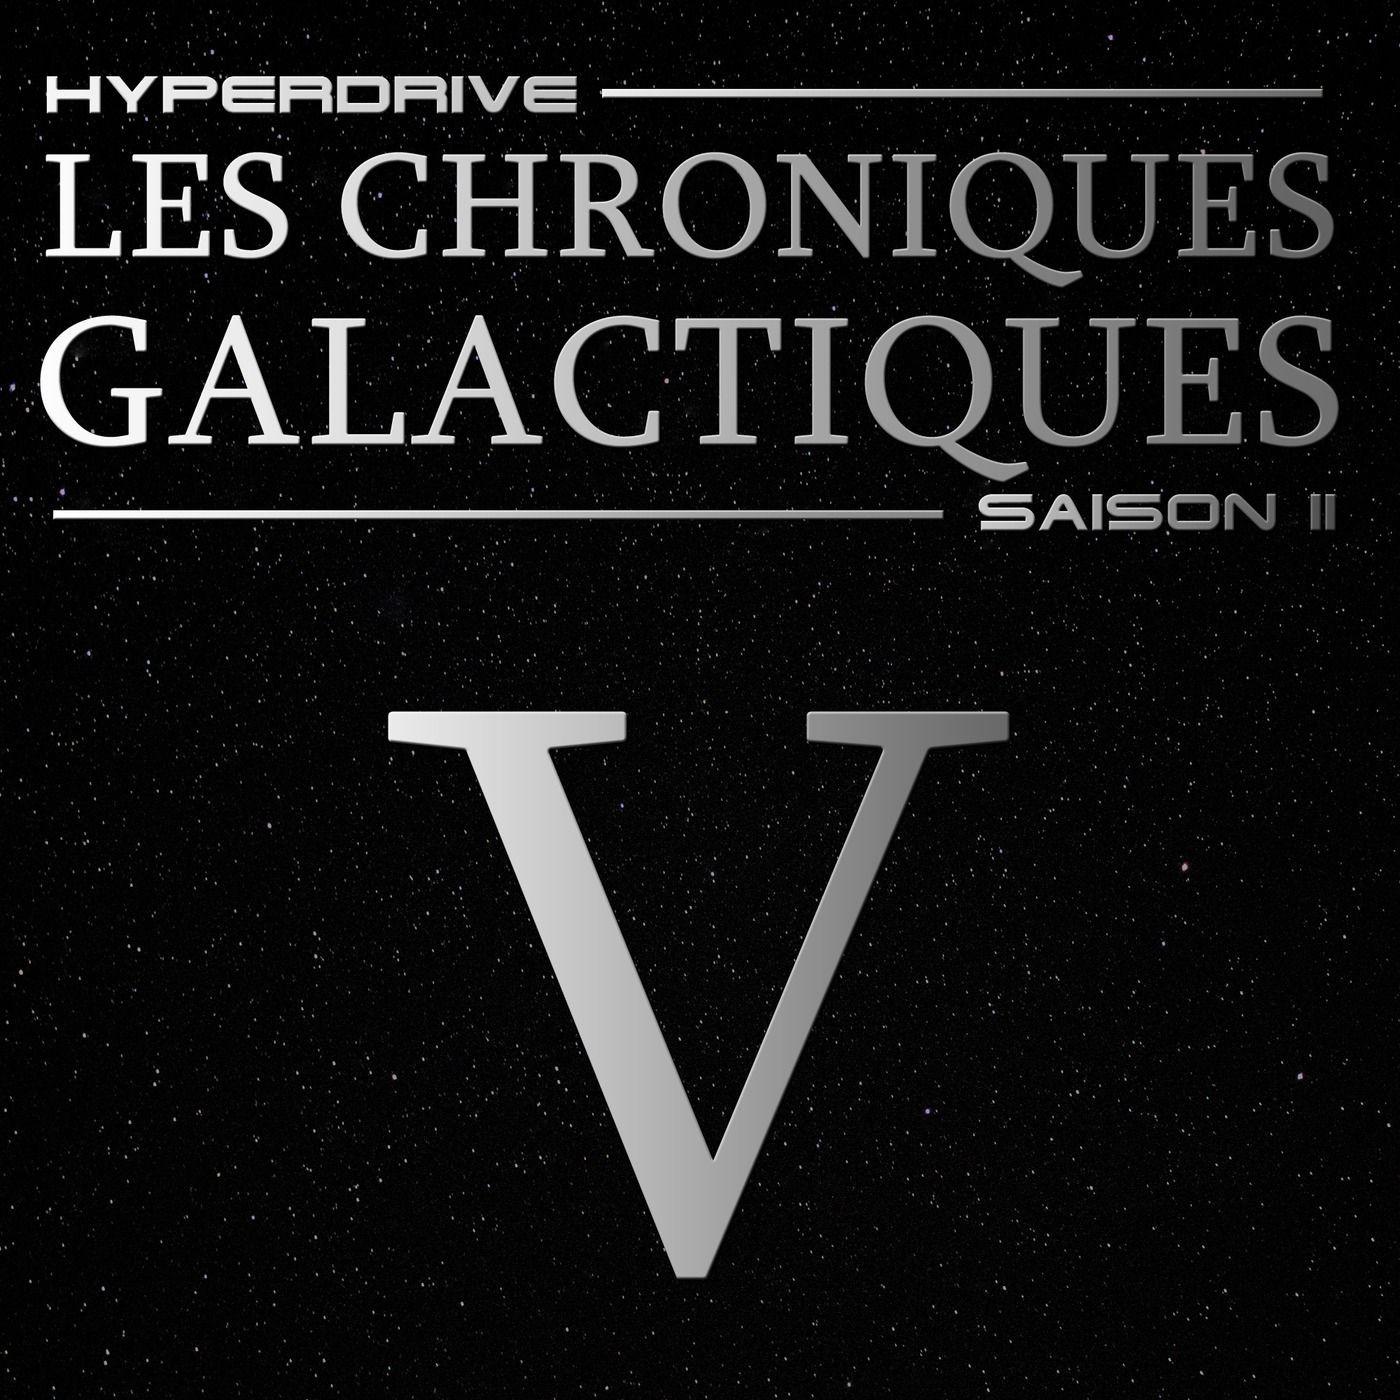 Chroniques Galactiques - S02 - Episode 5/7 - Cible prioritaire